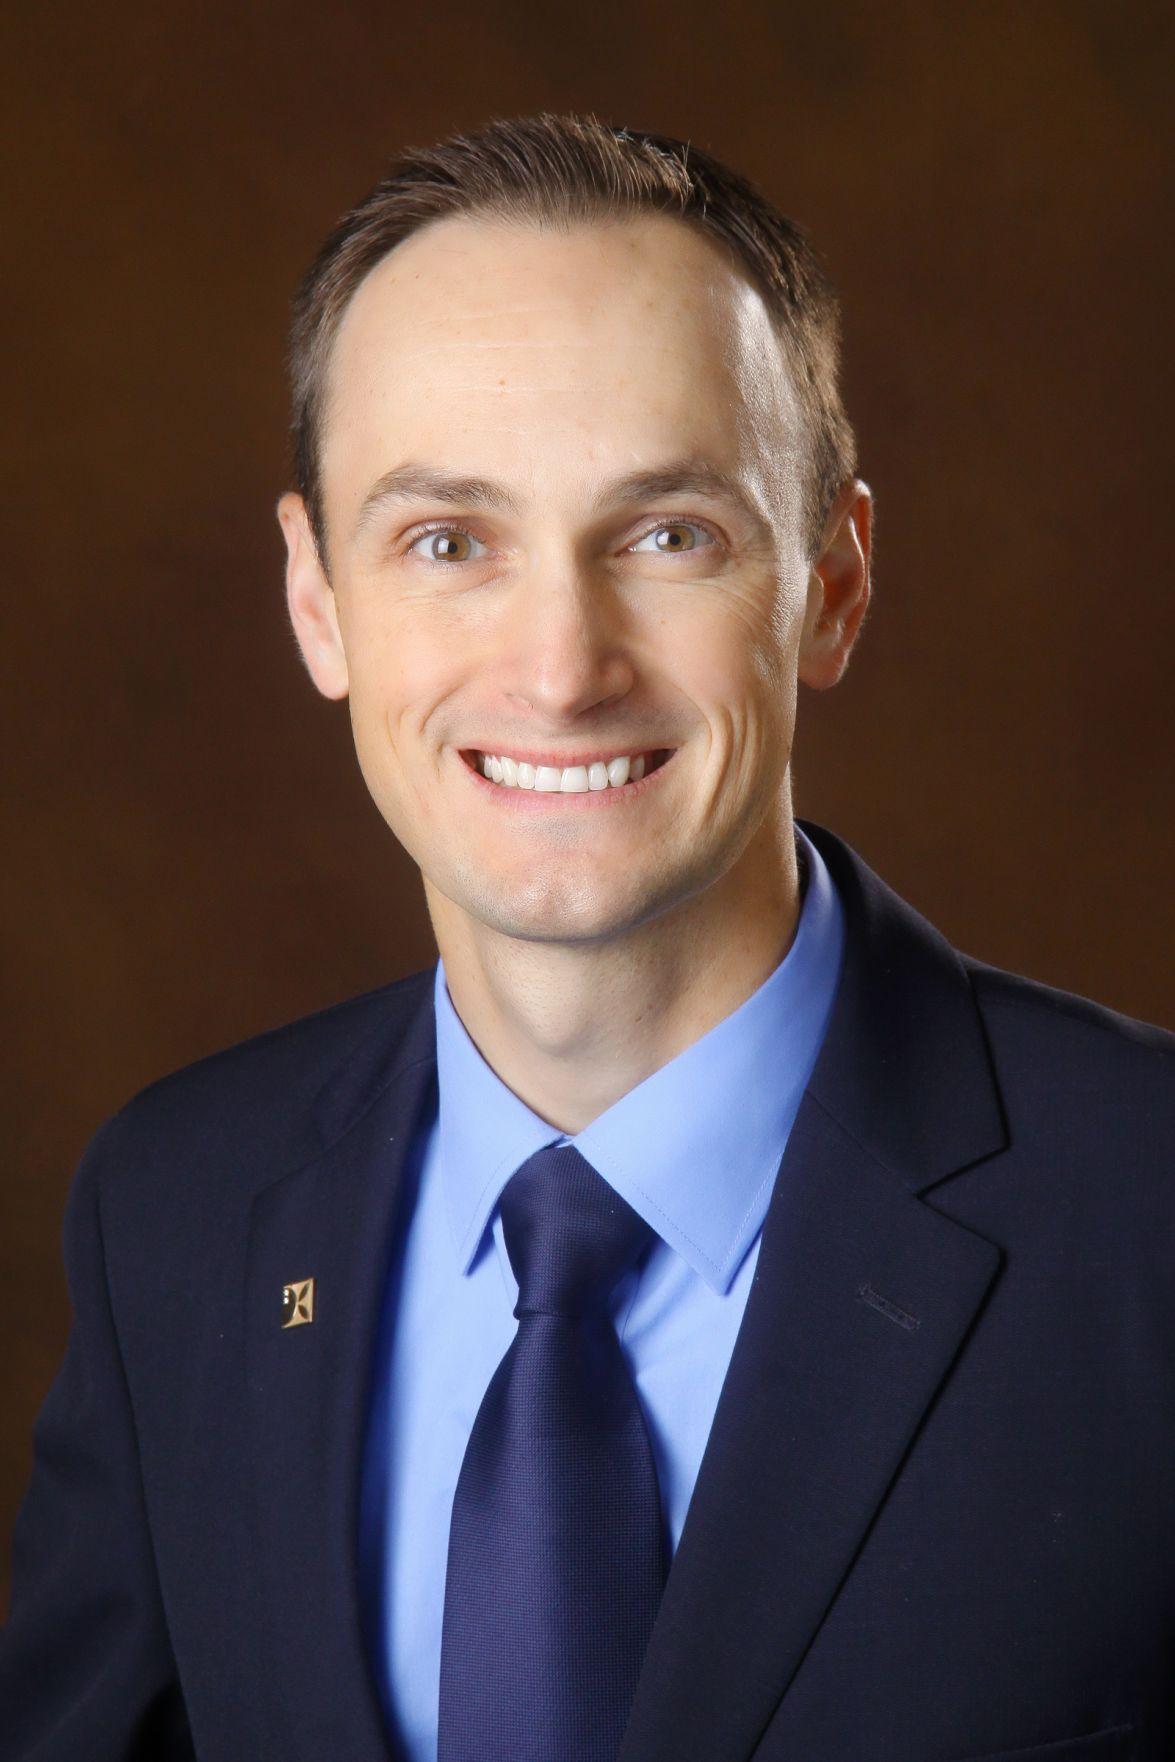 Nick Vrba